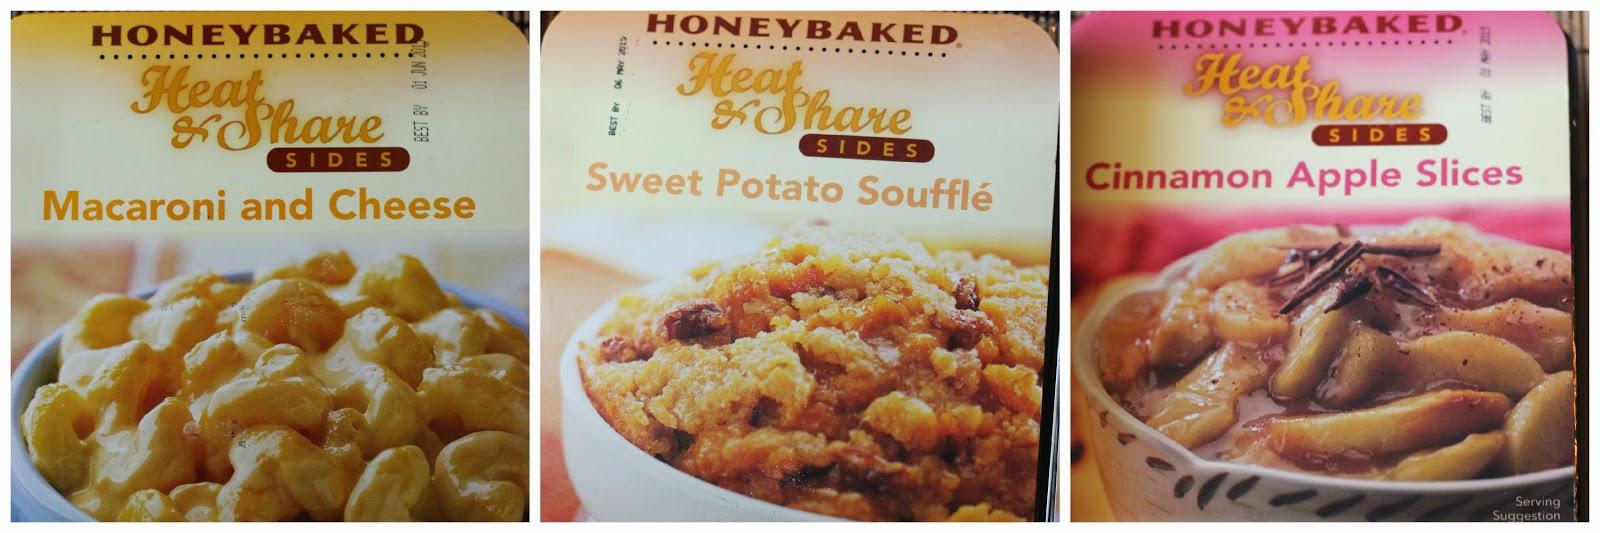 #HoneyBakedEaster #Ad